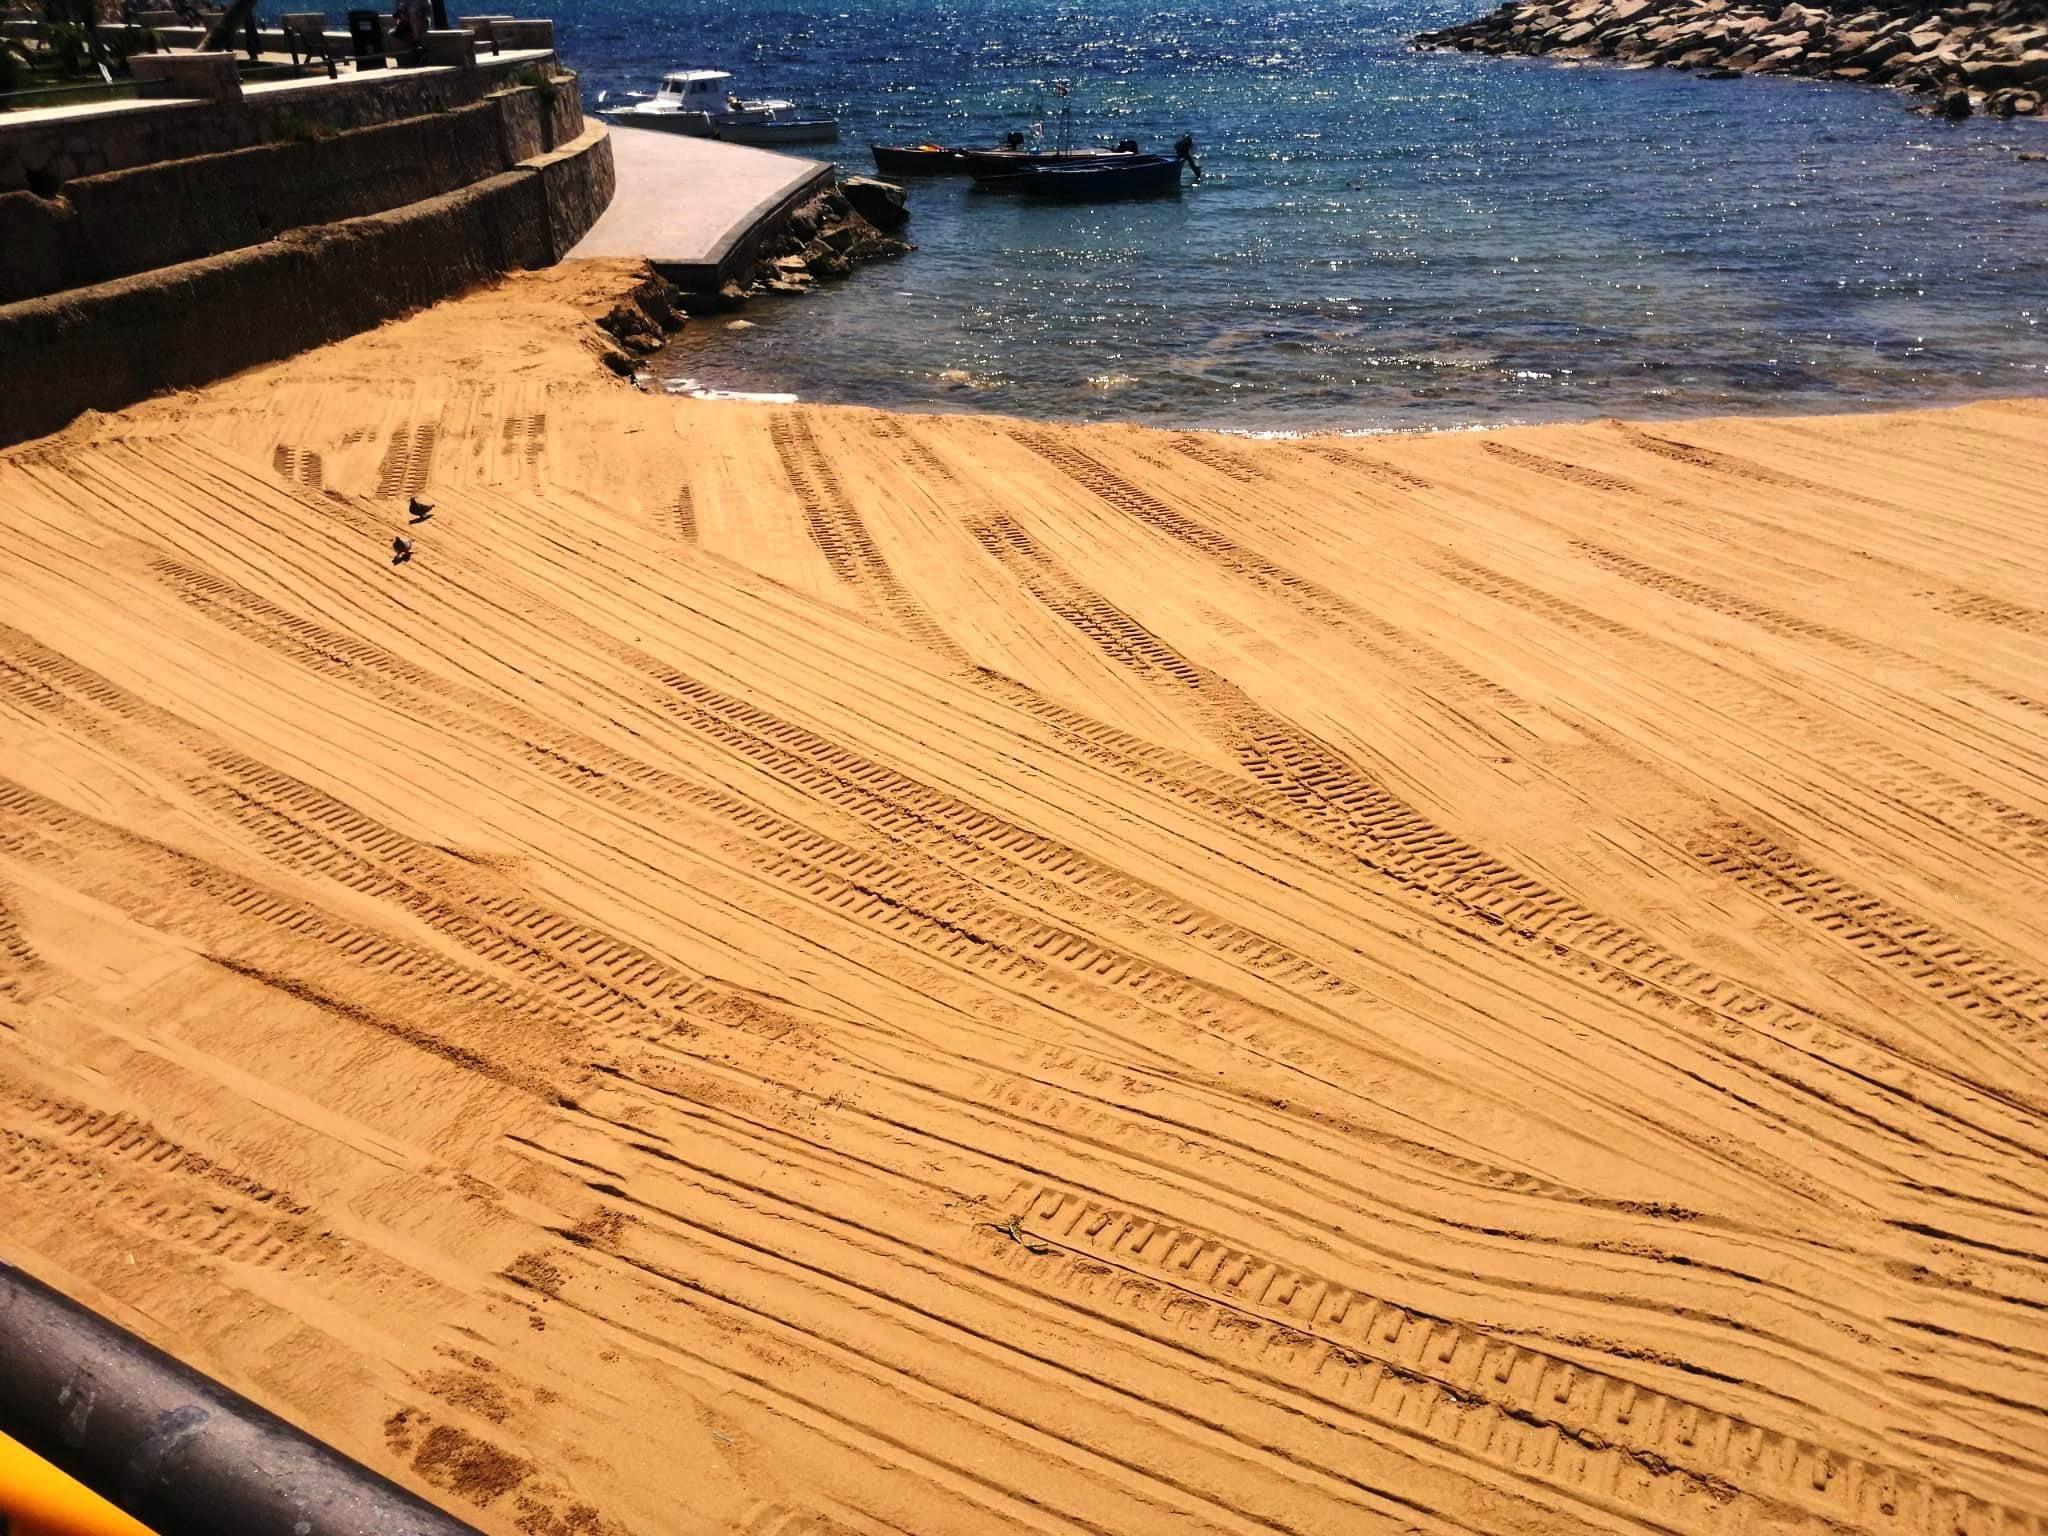 Castellabate, pulizia spiagge sulla costa di Benvenuti al Sud